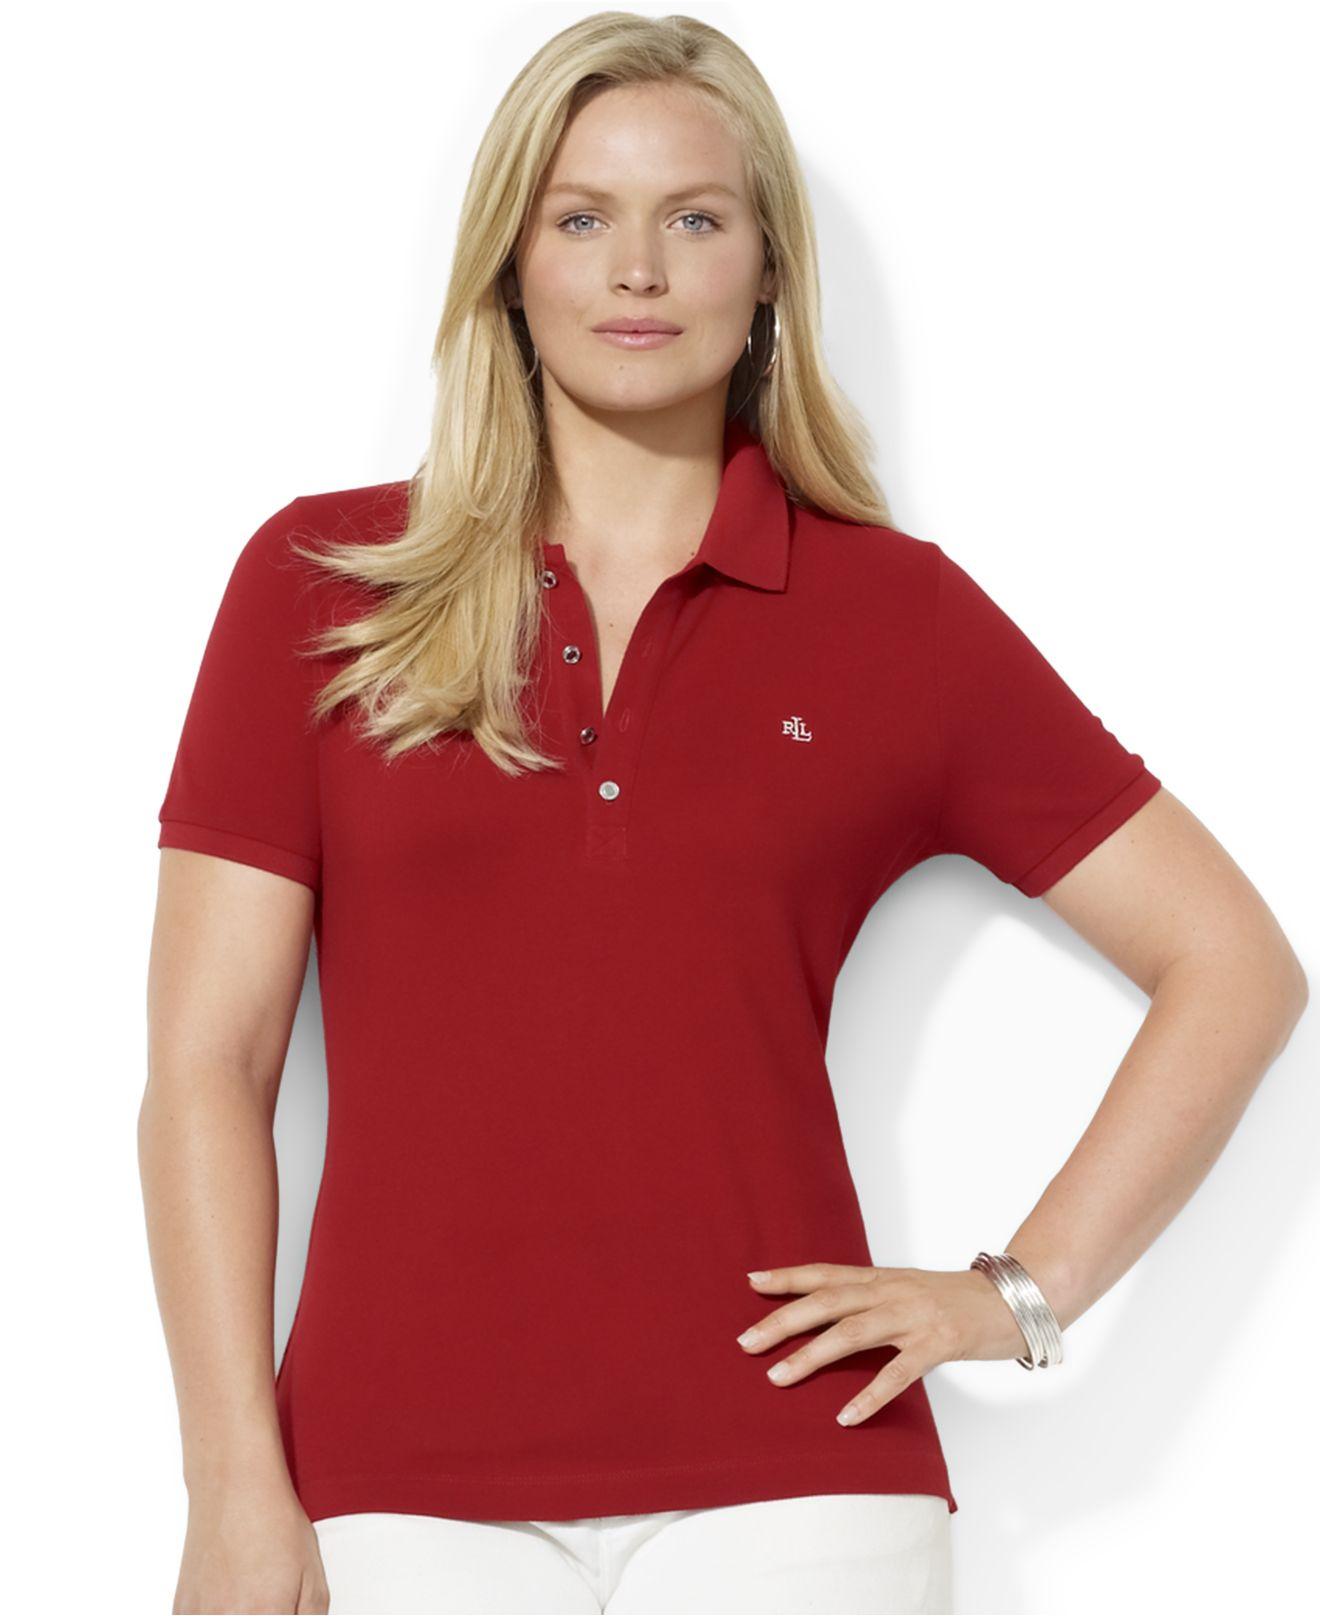 102cb93585c5d9 ... discount lyst lauren by ralph lauren plus size polo shirt in red a663c  09a7e